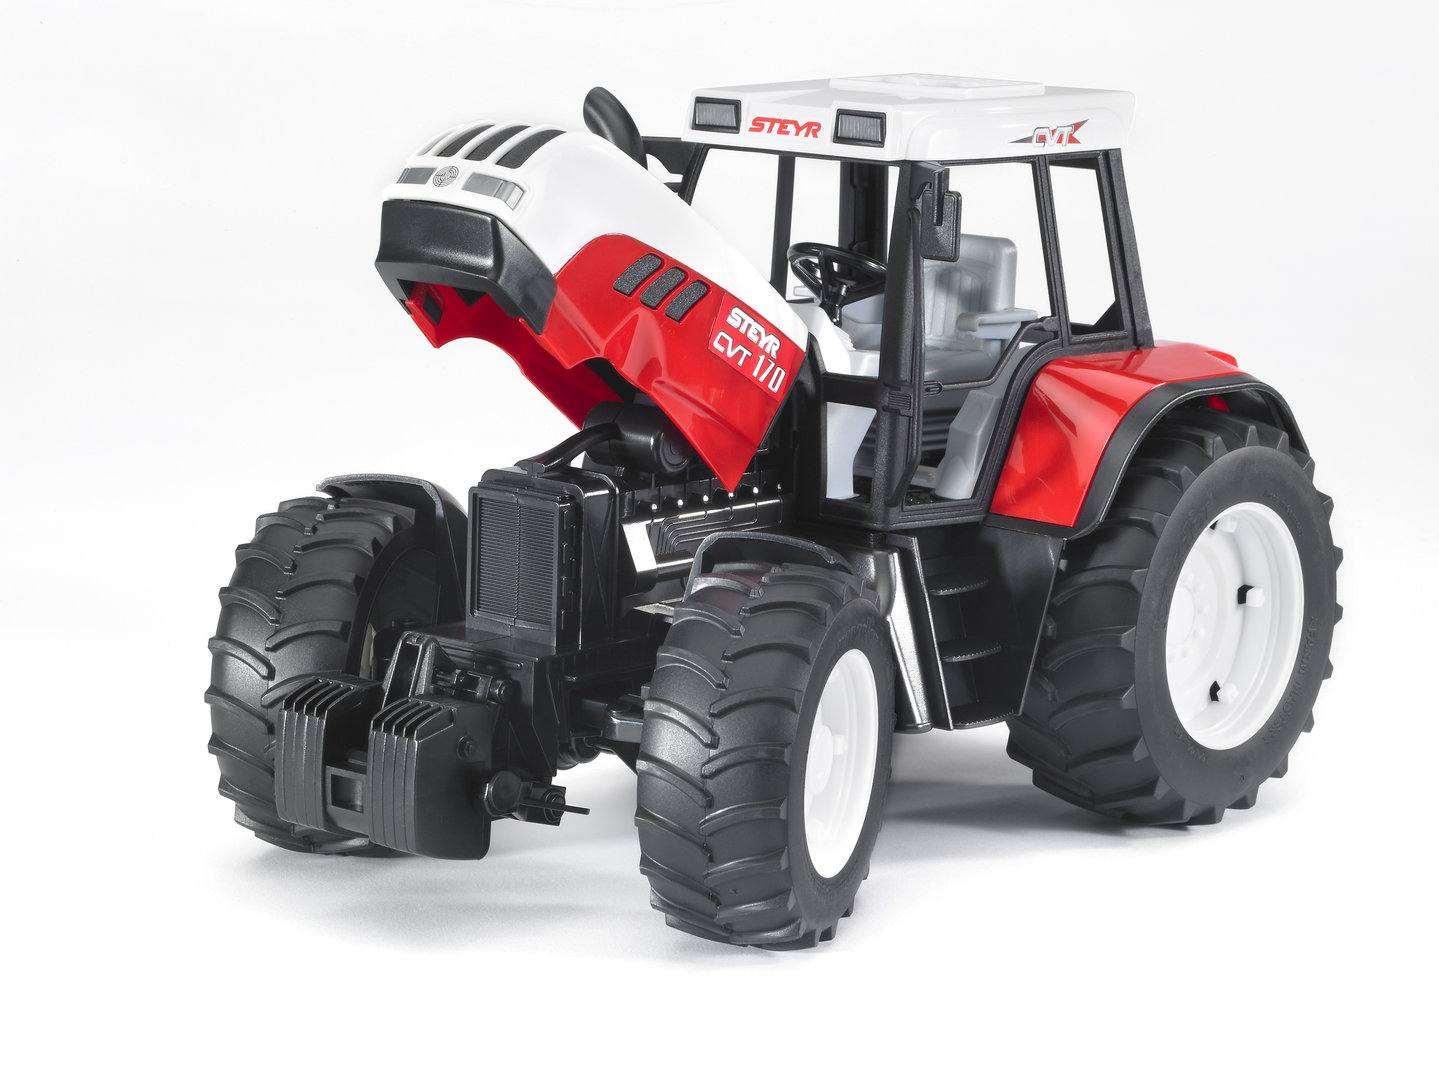 steyr cvt 170  bruder spielzeug traktorbruder steyr